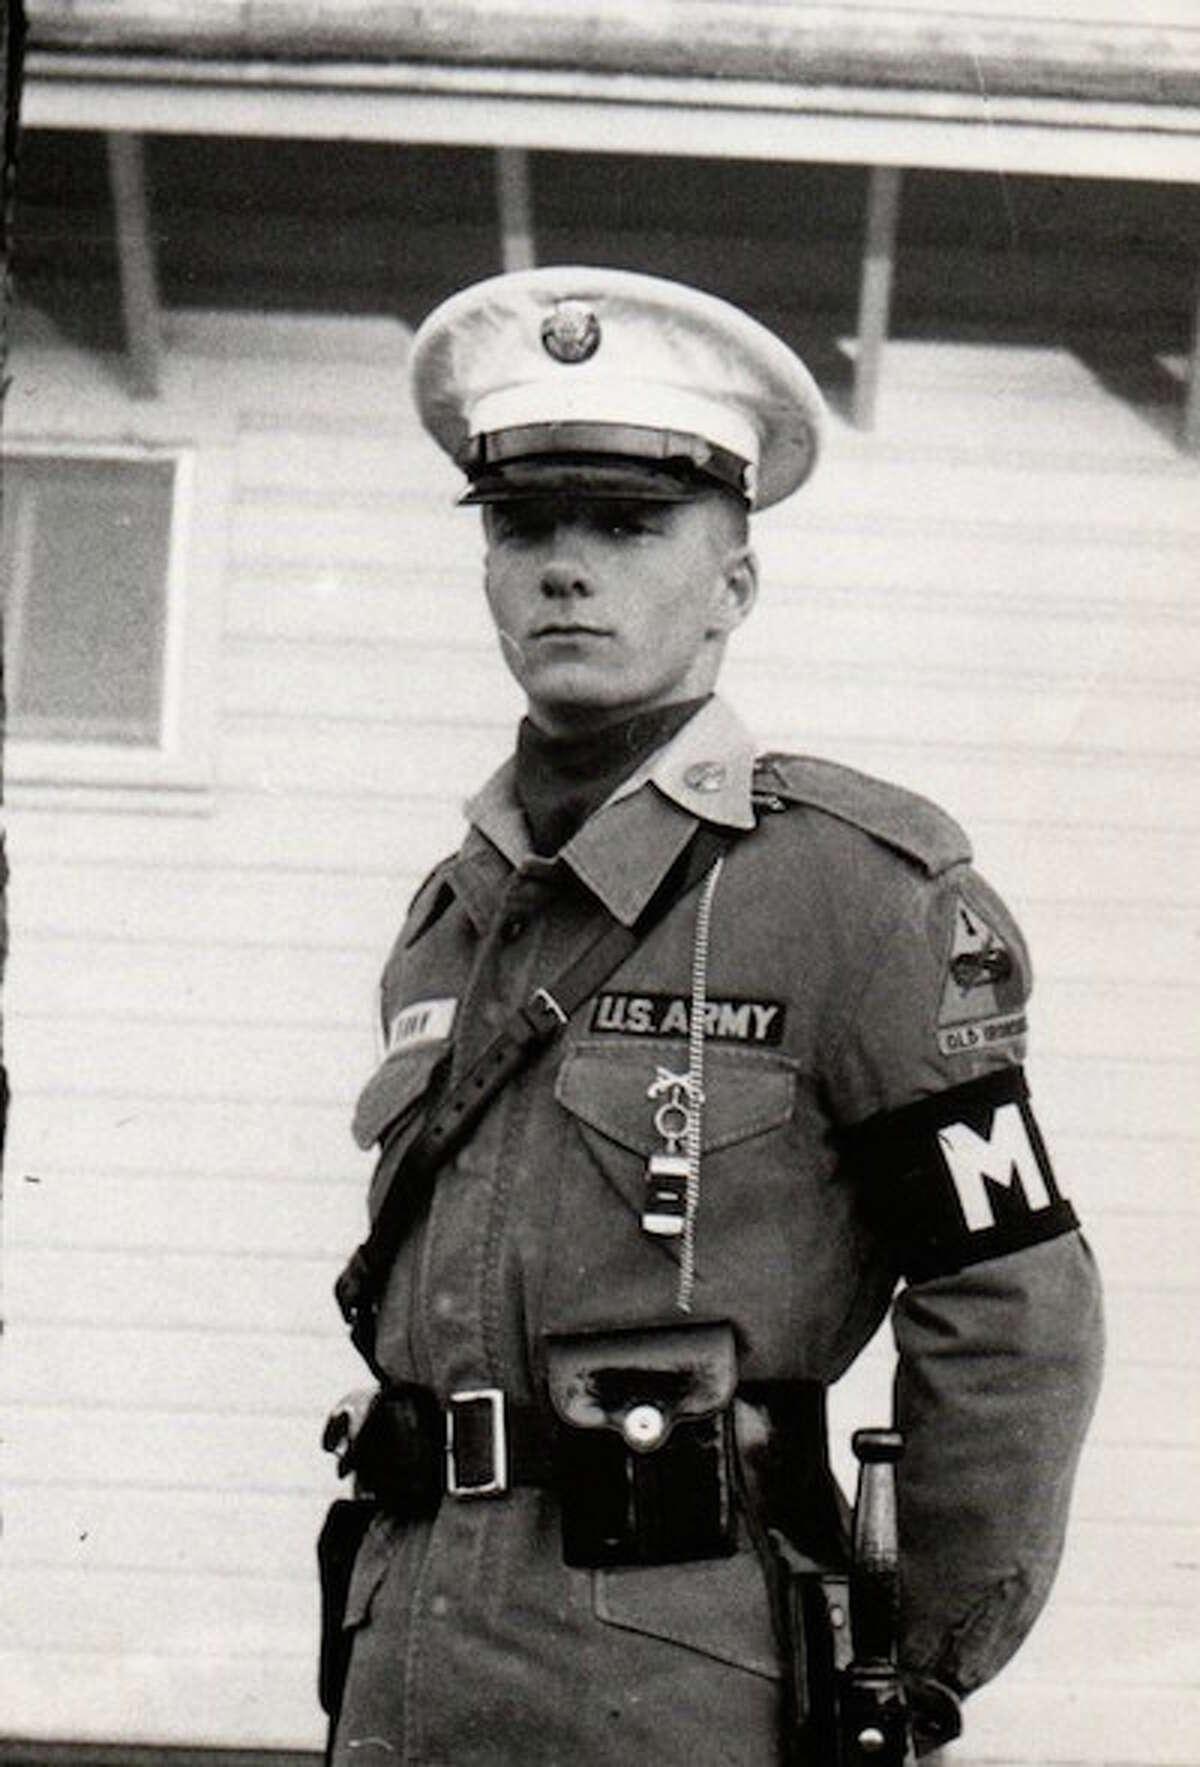 Korean War veteran Frank Dunn has been a member of American Legion Post 86 in Wilton, for 15 years.